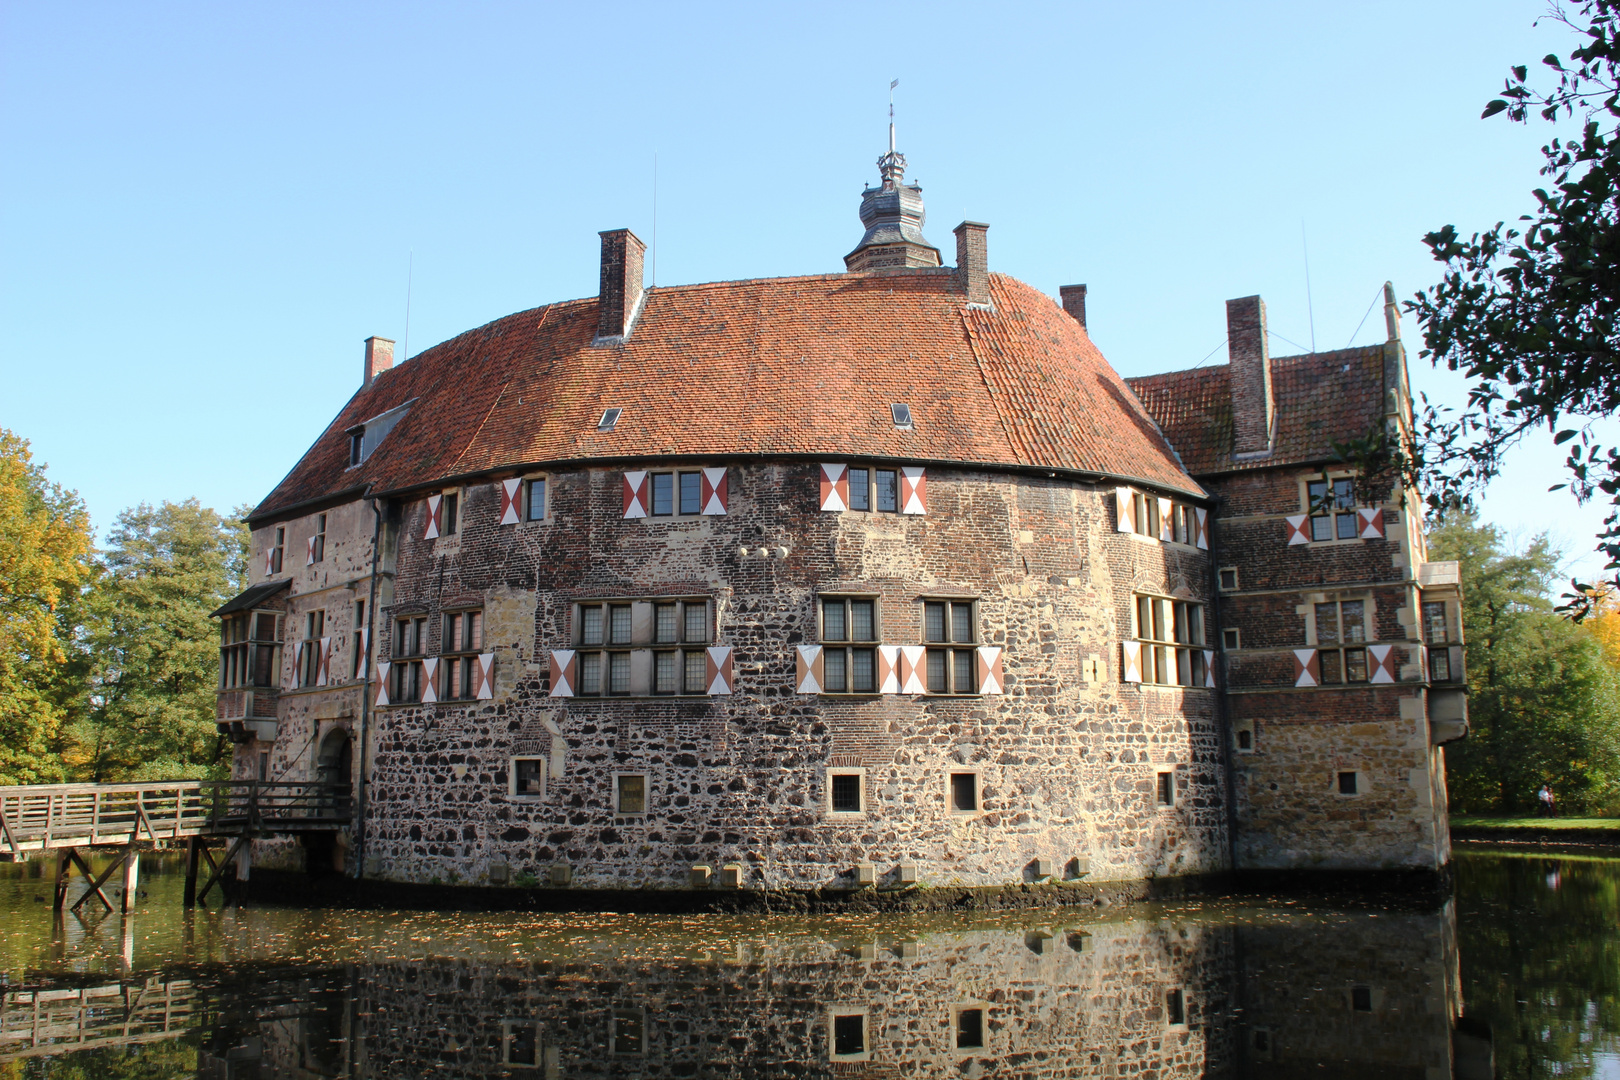 Burg Fischering